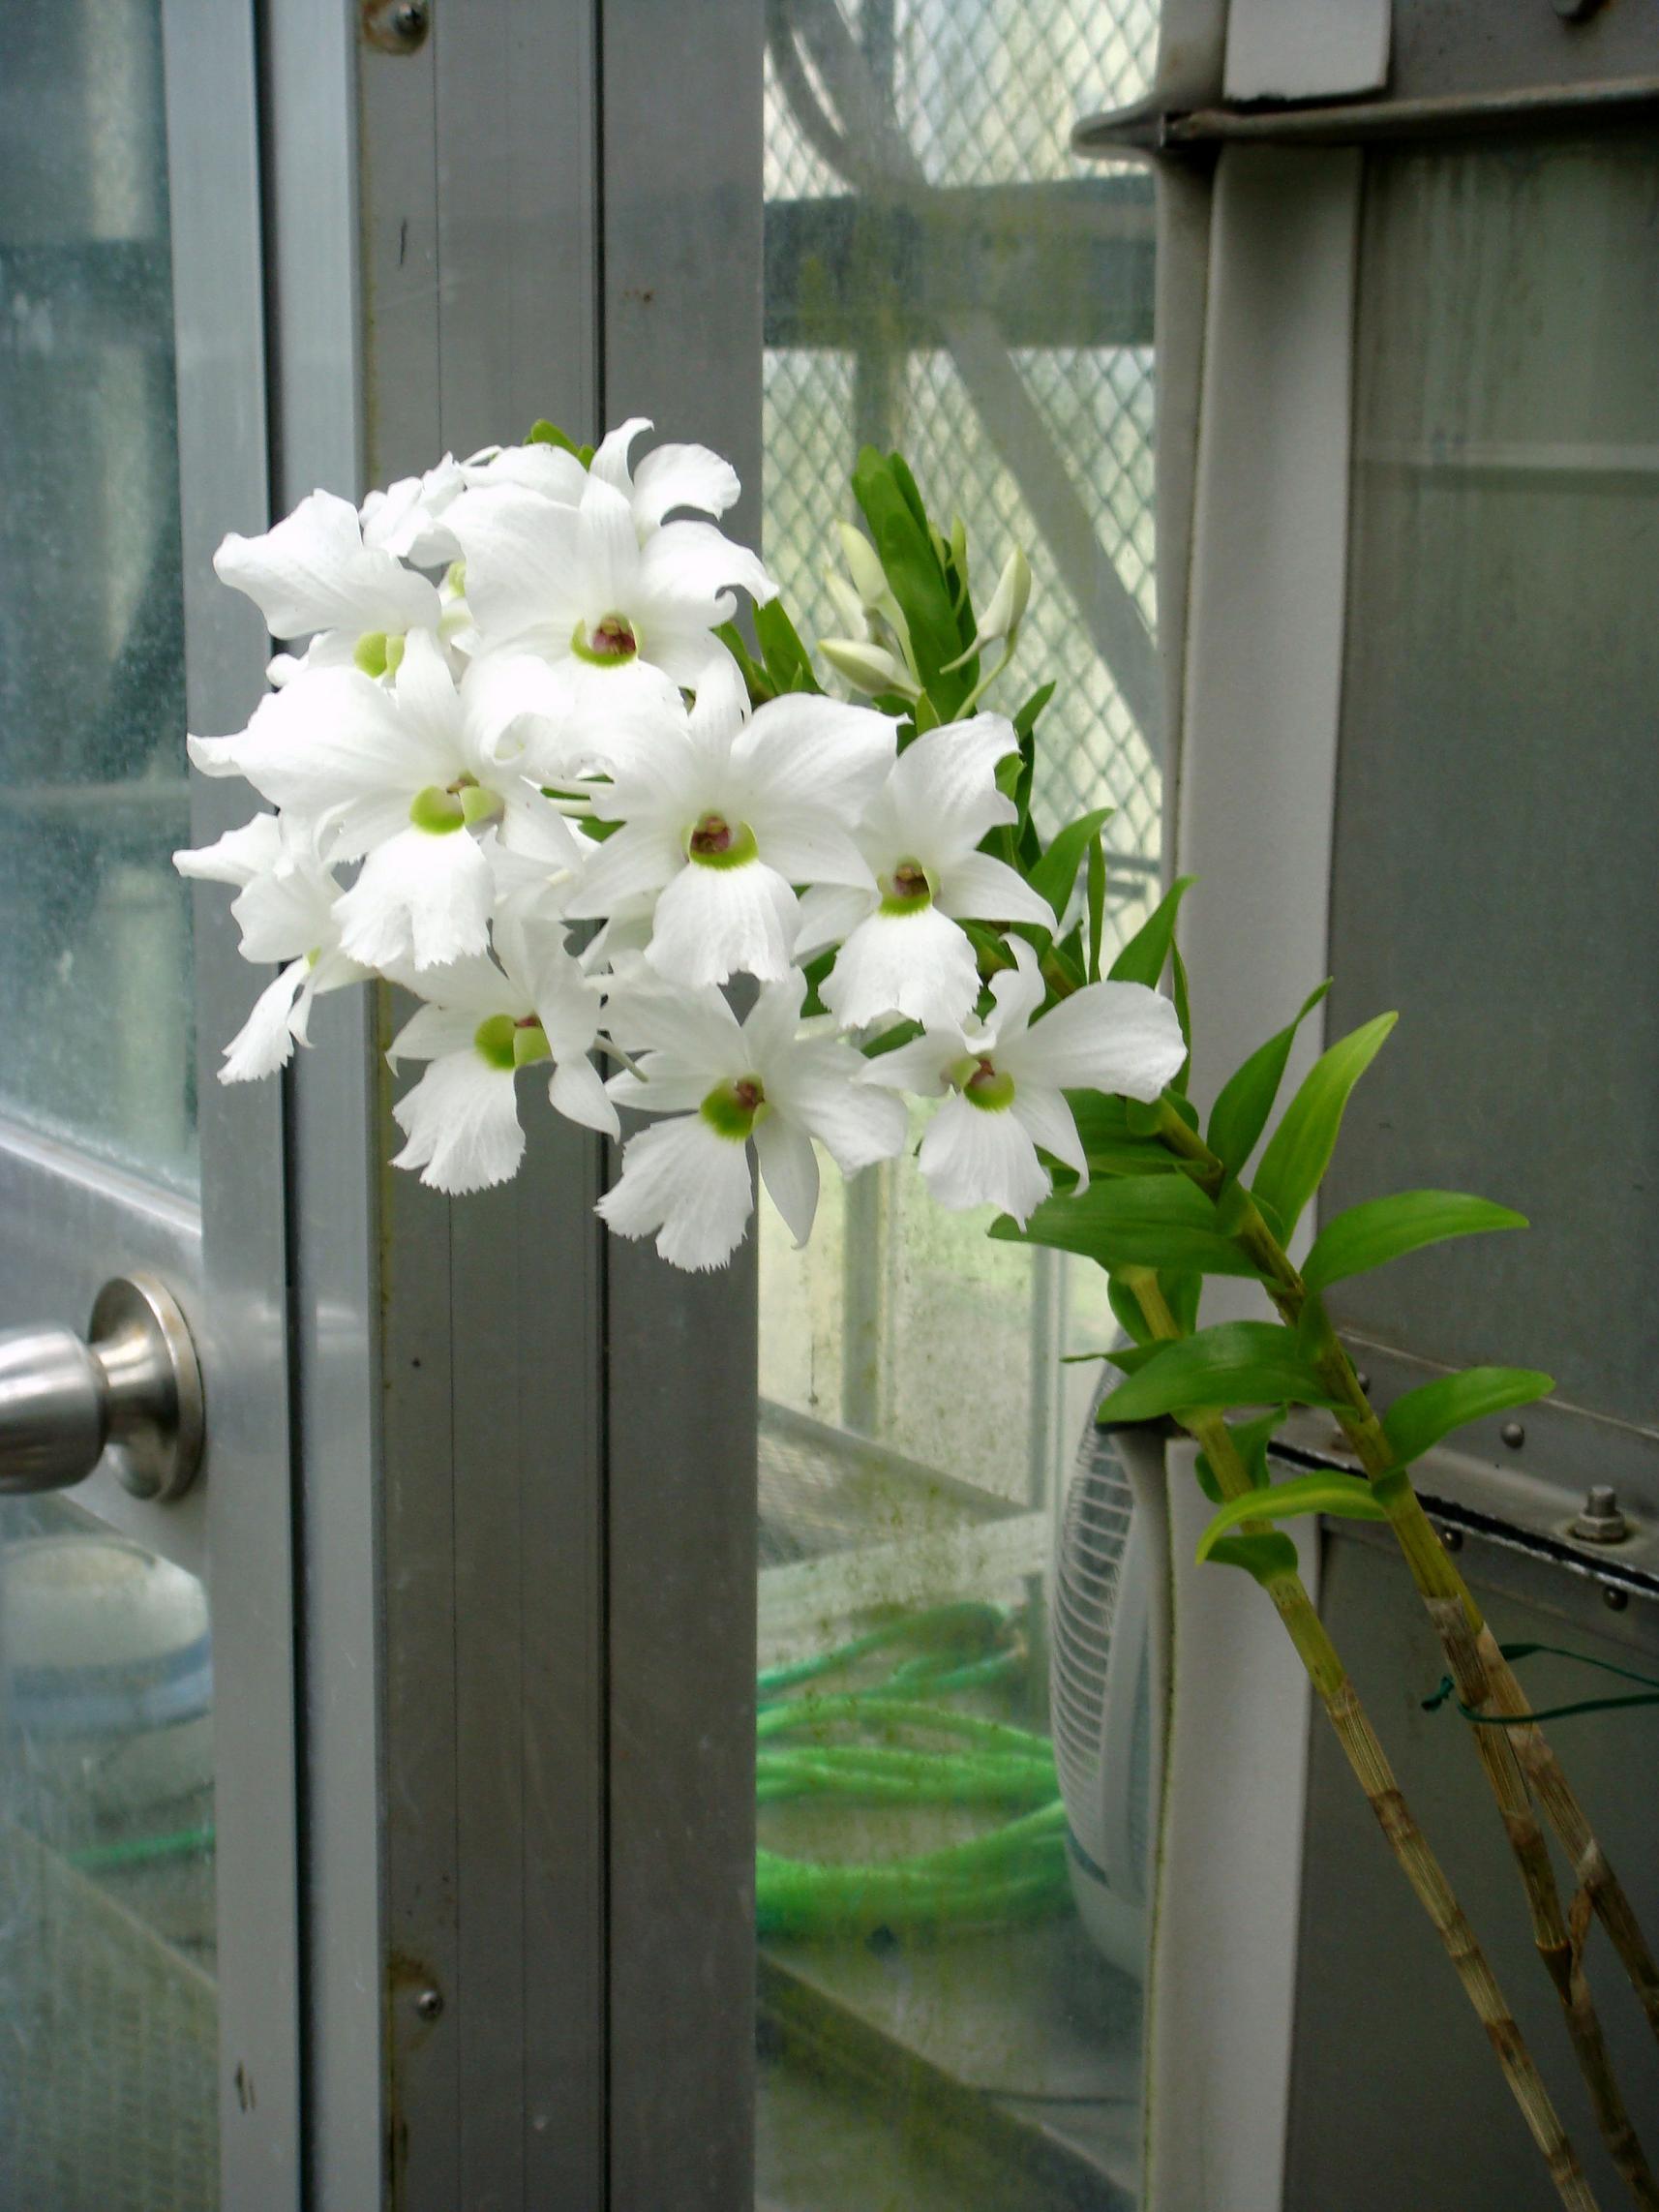 http://orchids.la.coocan.jp/Dendrobium/Dendrobium%20sanderae%20luzonicum/DSC06432.JPG